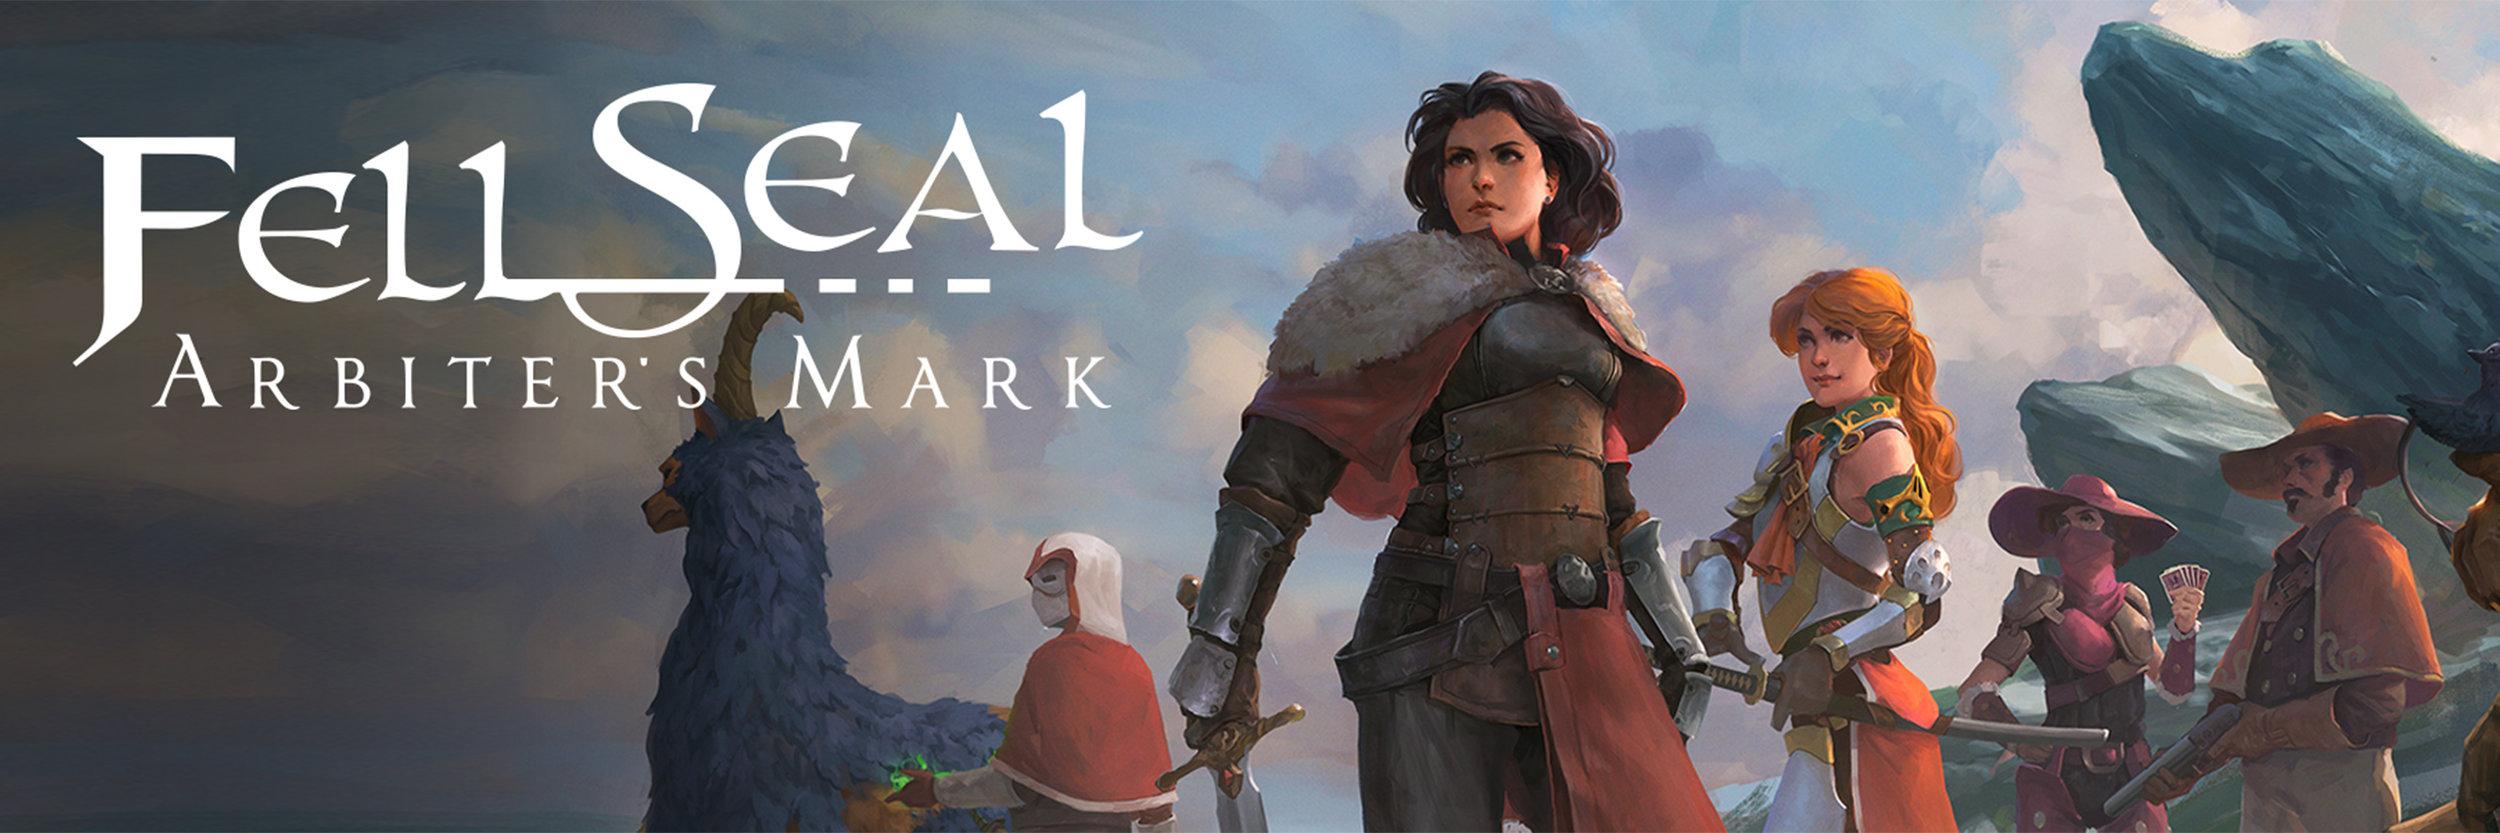 Fell Seal - Terminals banner.jpg